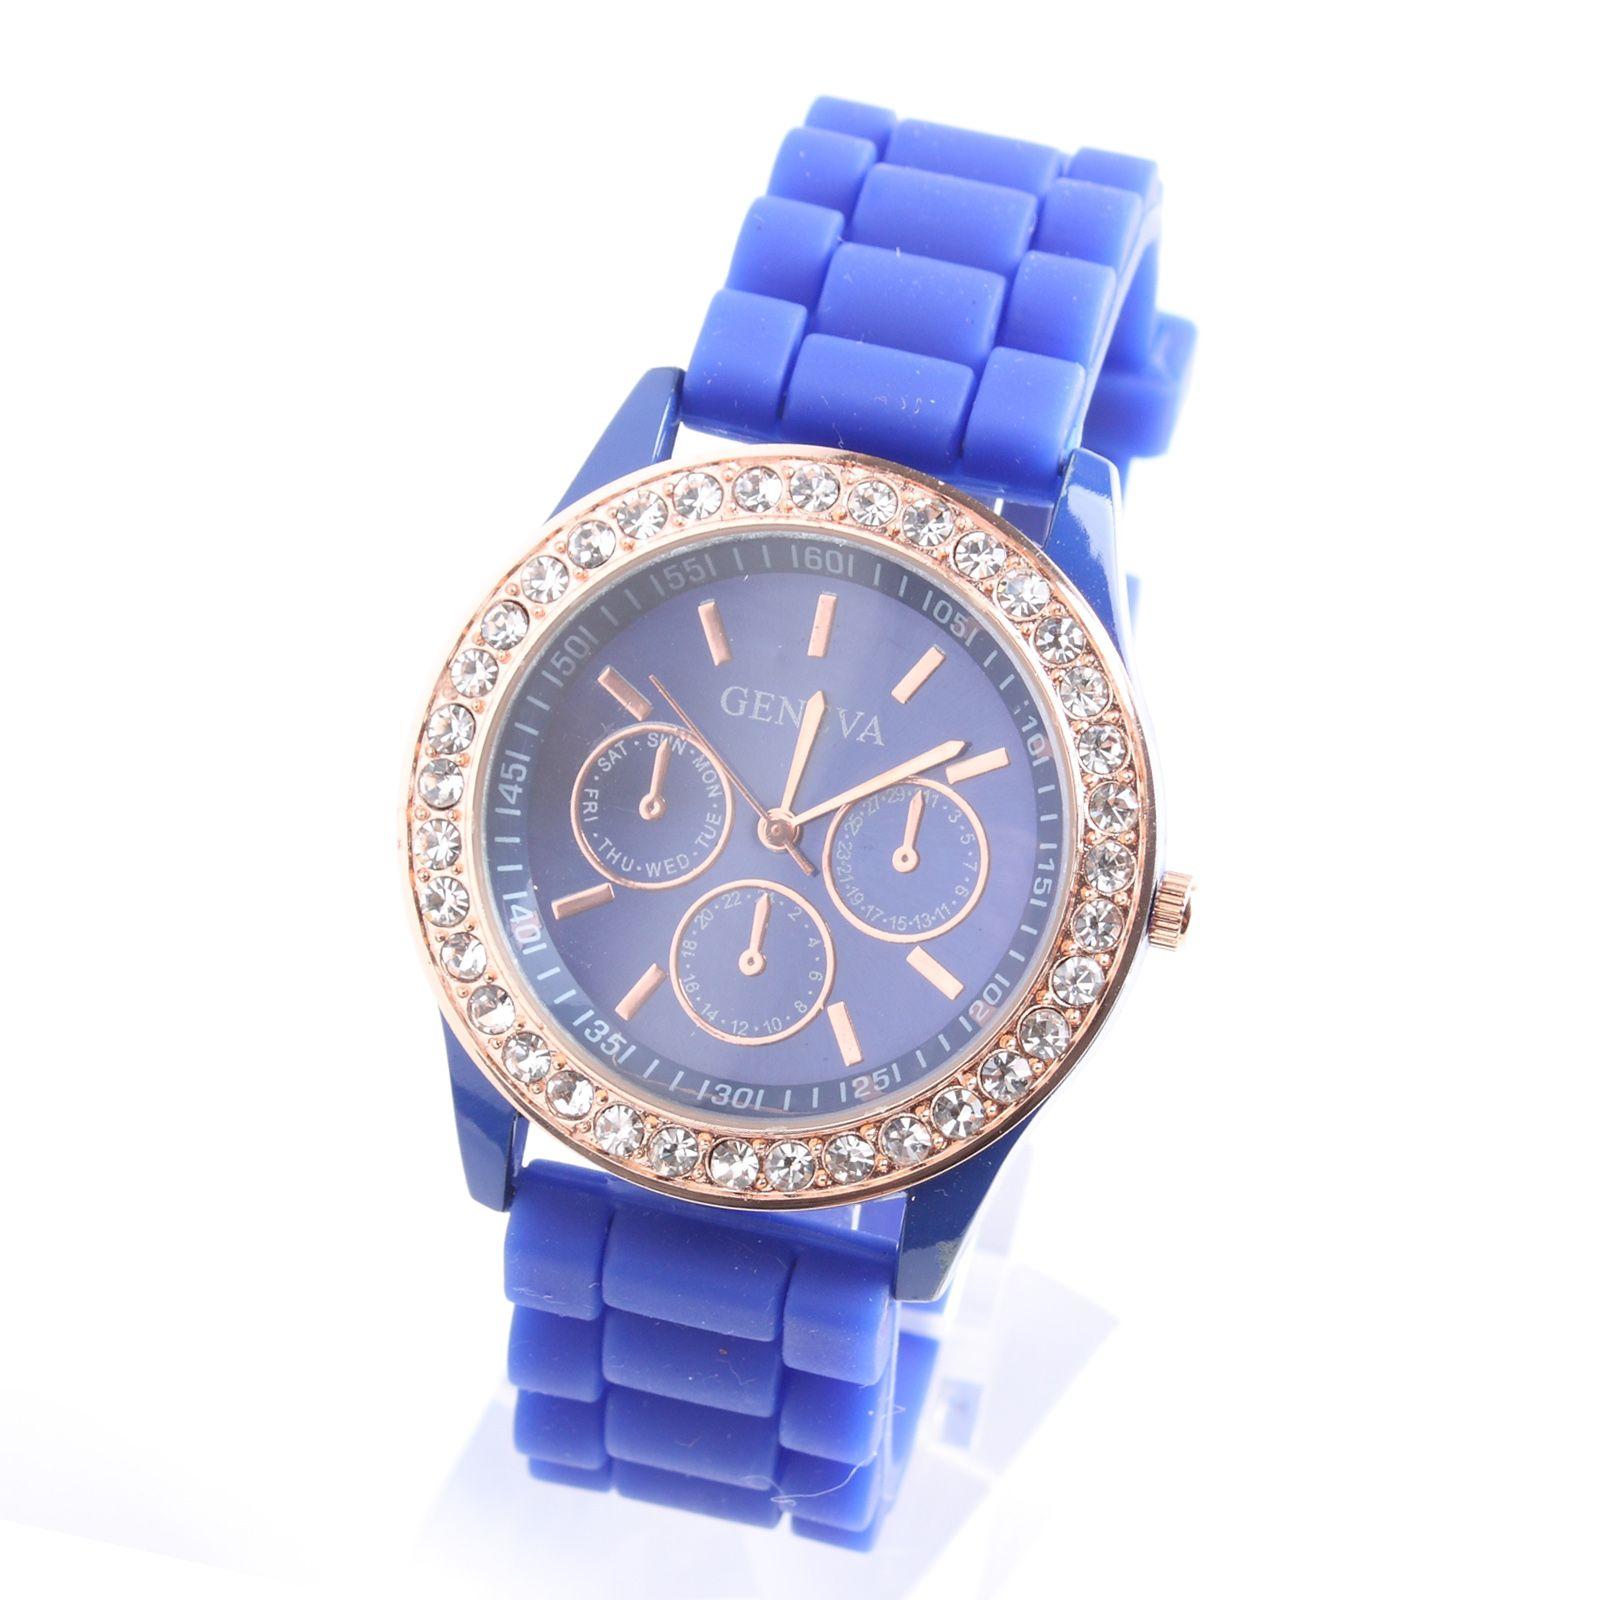 New 10 Color Silicone Jelly Gel Quartz Wrist Watch Girls Women with